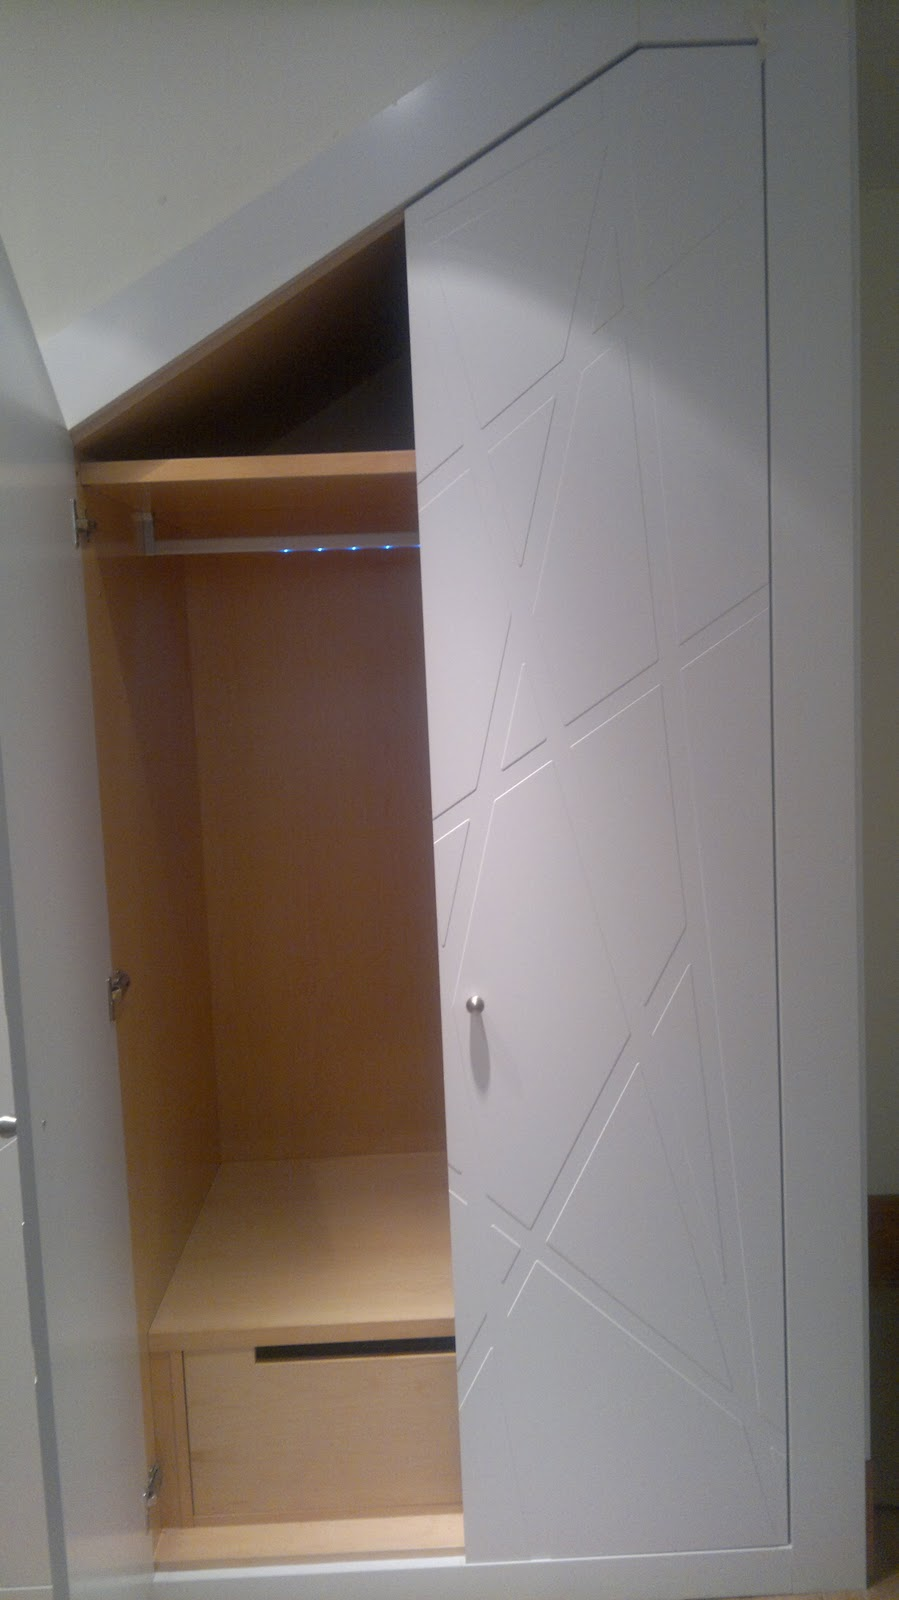 Ebanisteria carpinteria manuel perez zaragoza armario for Puerta para escalera